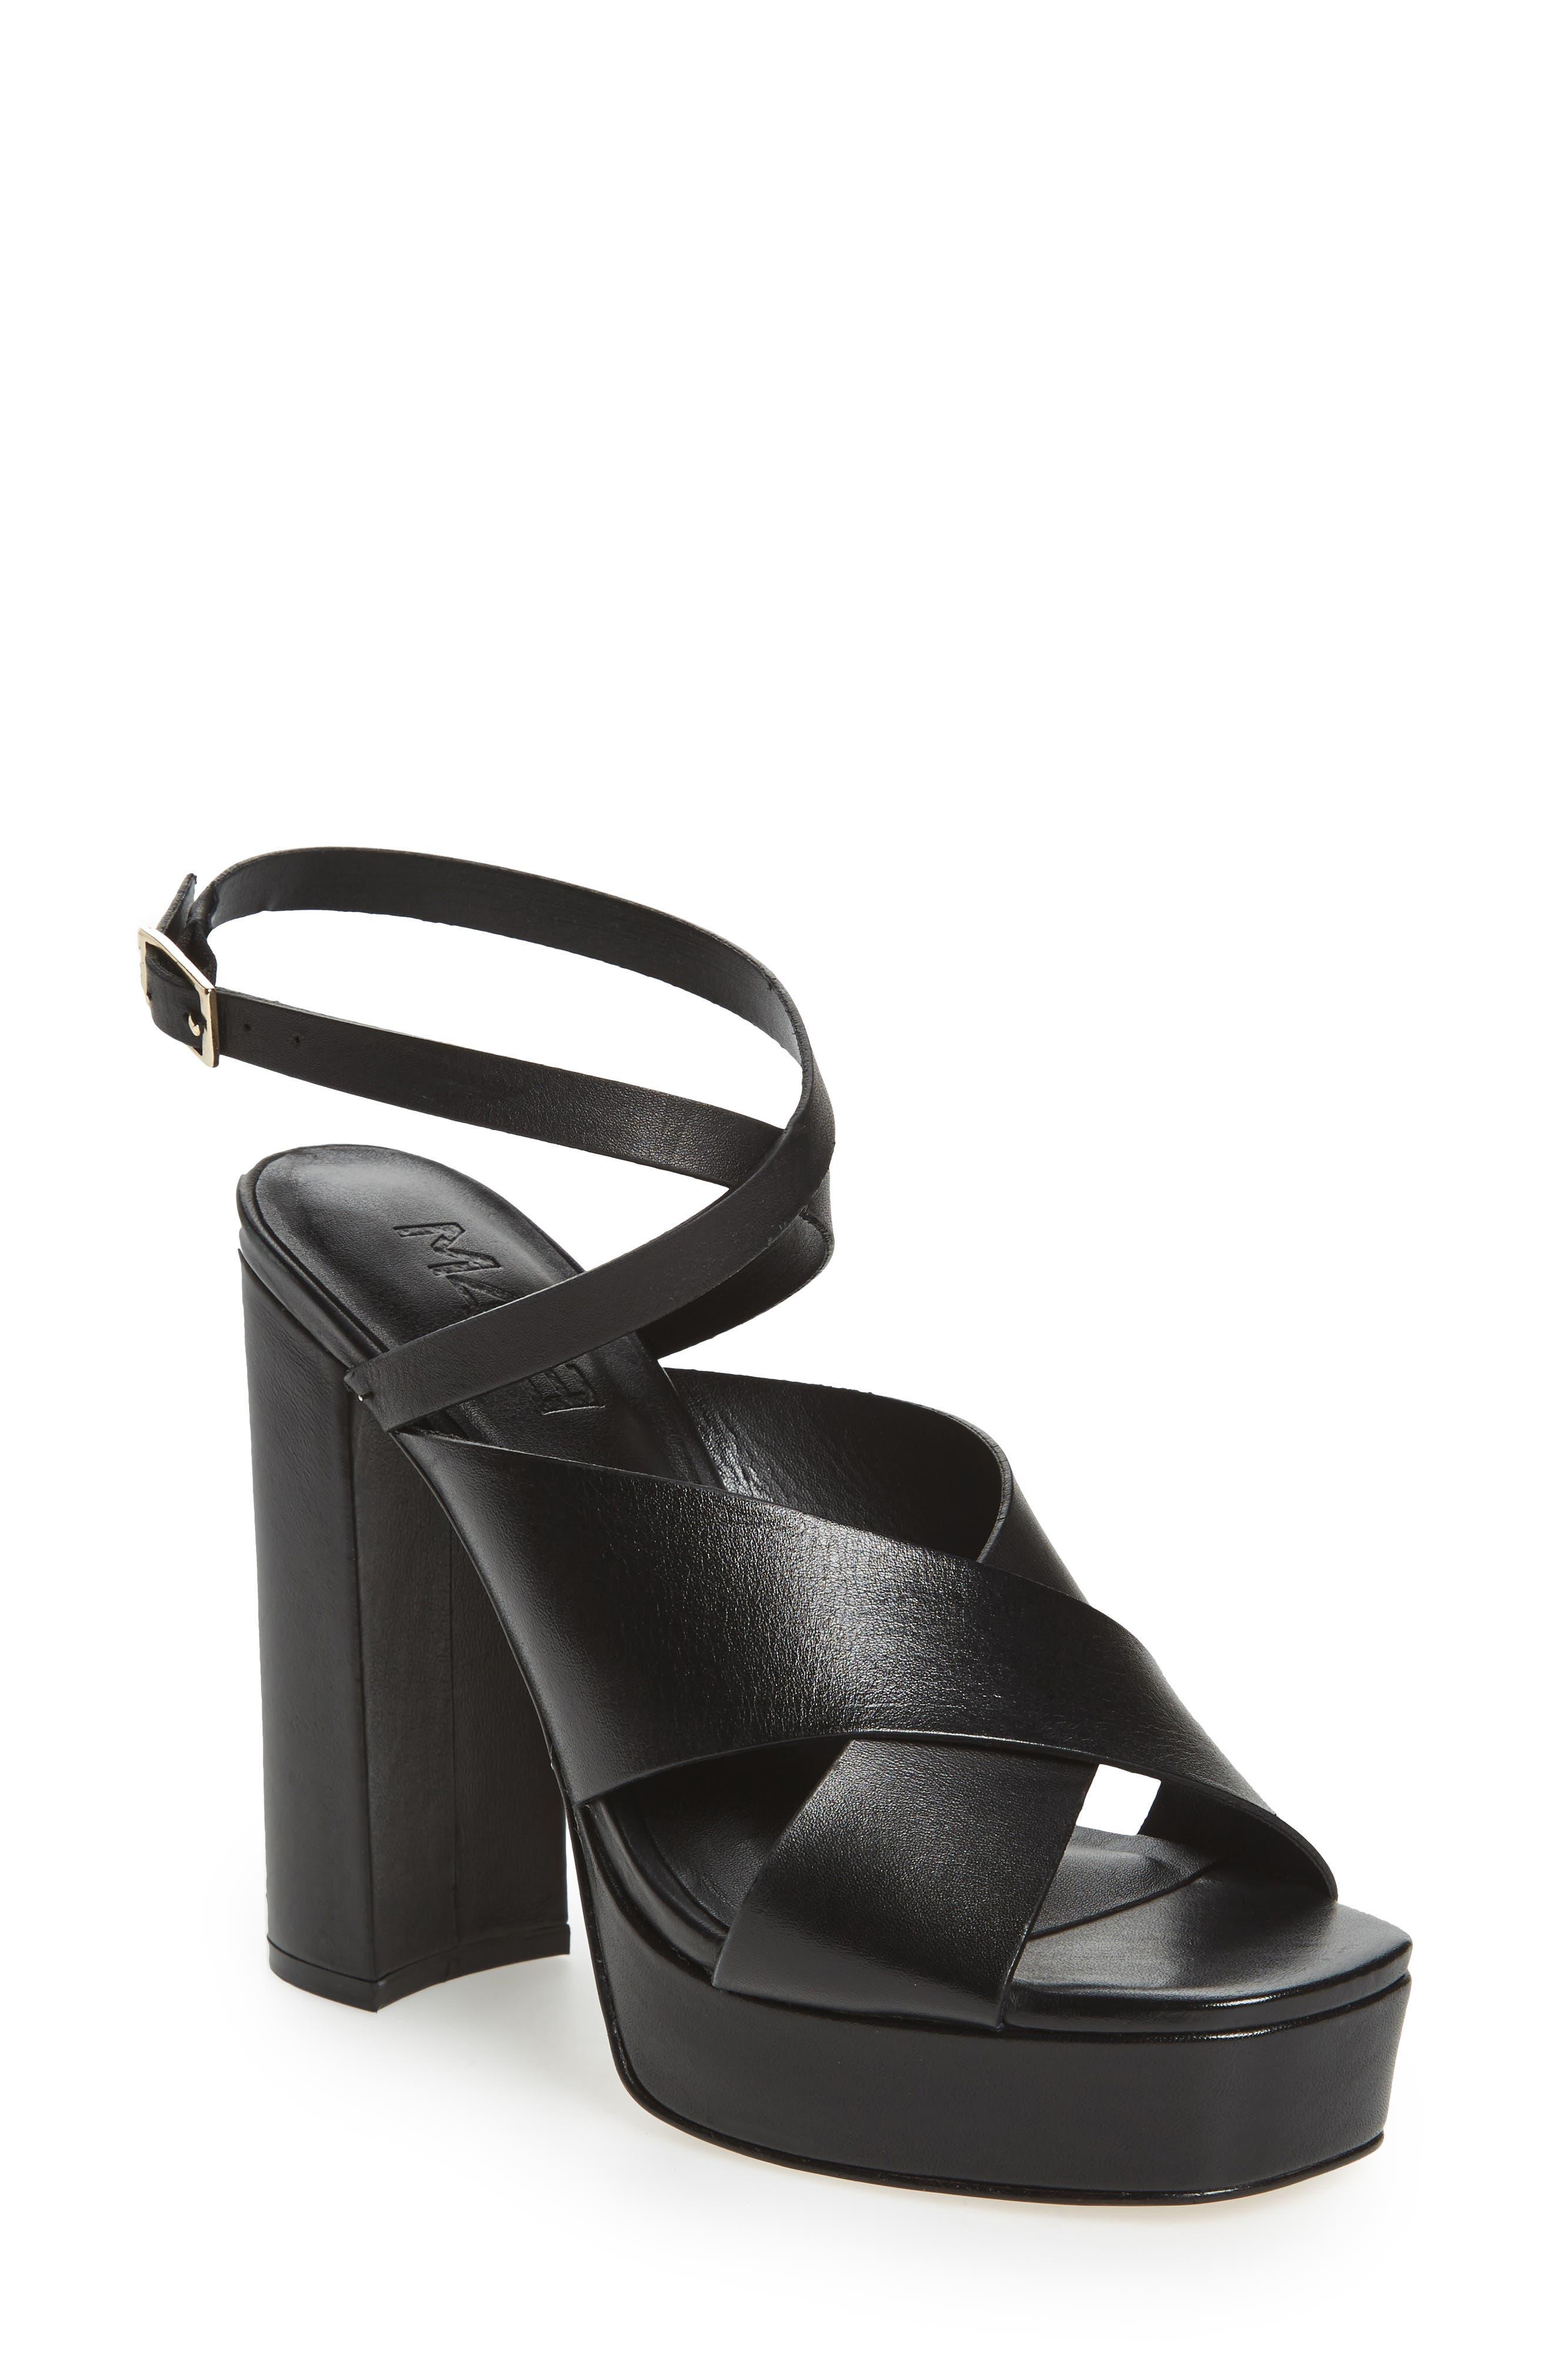 M4D3 Priscilla Wraparound Platform Sandal,                         Main,                         color, BLACK